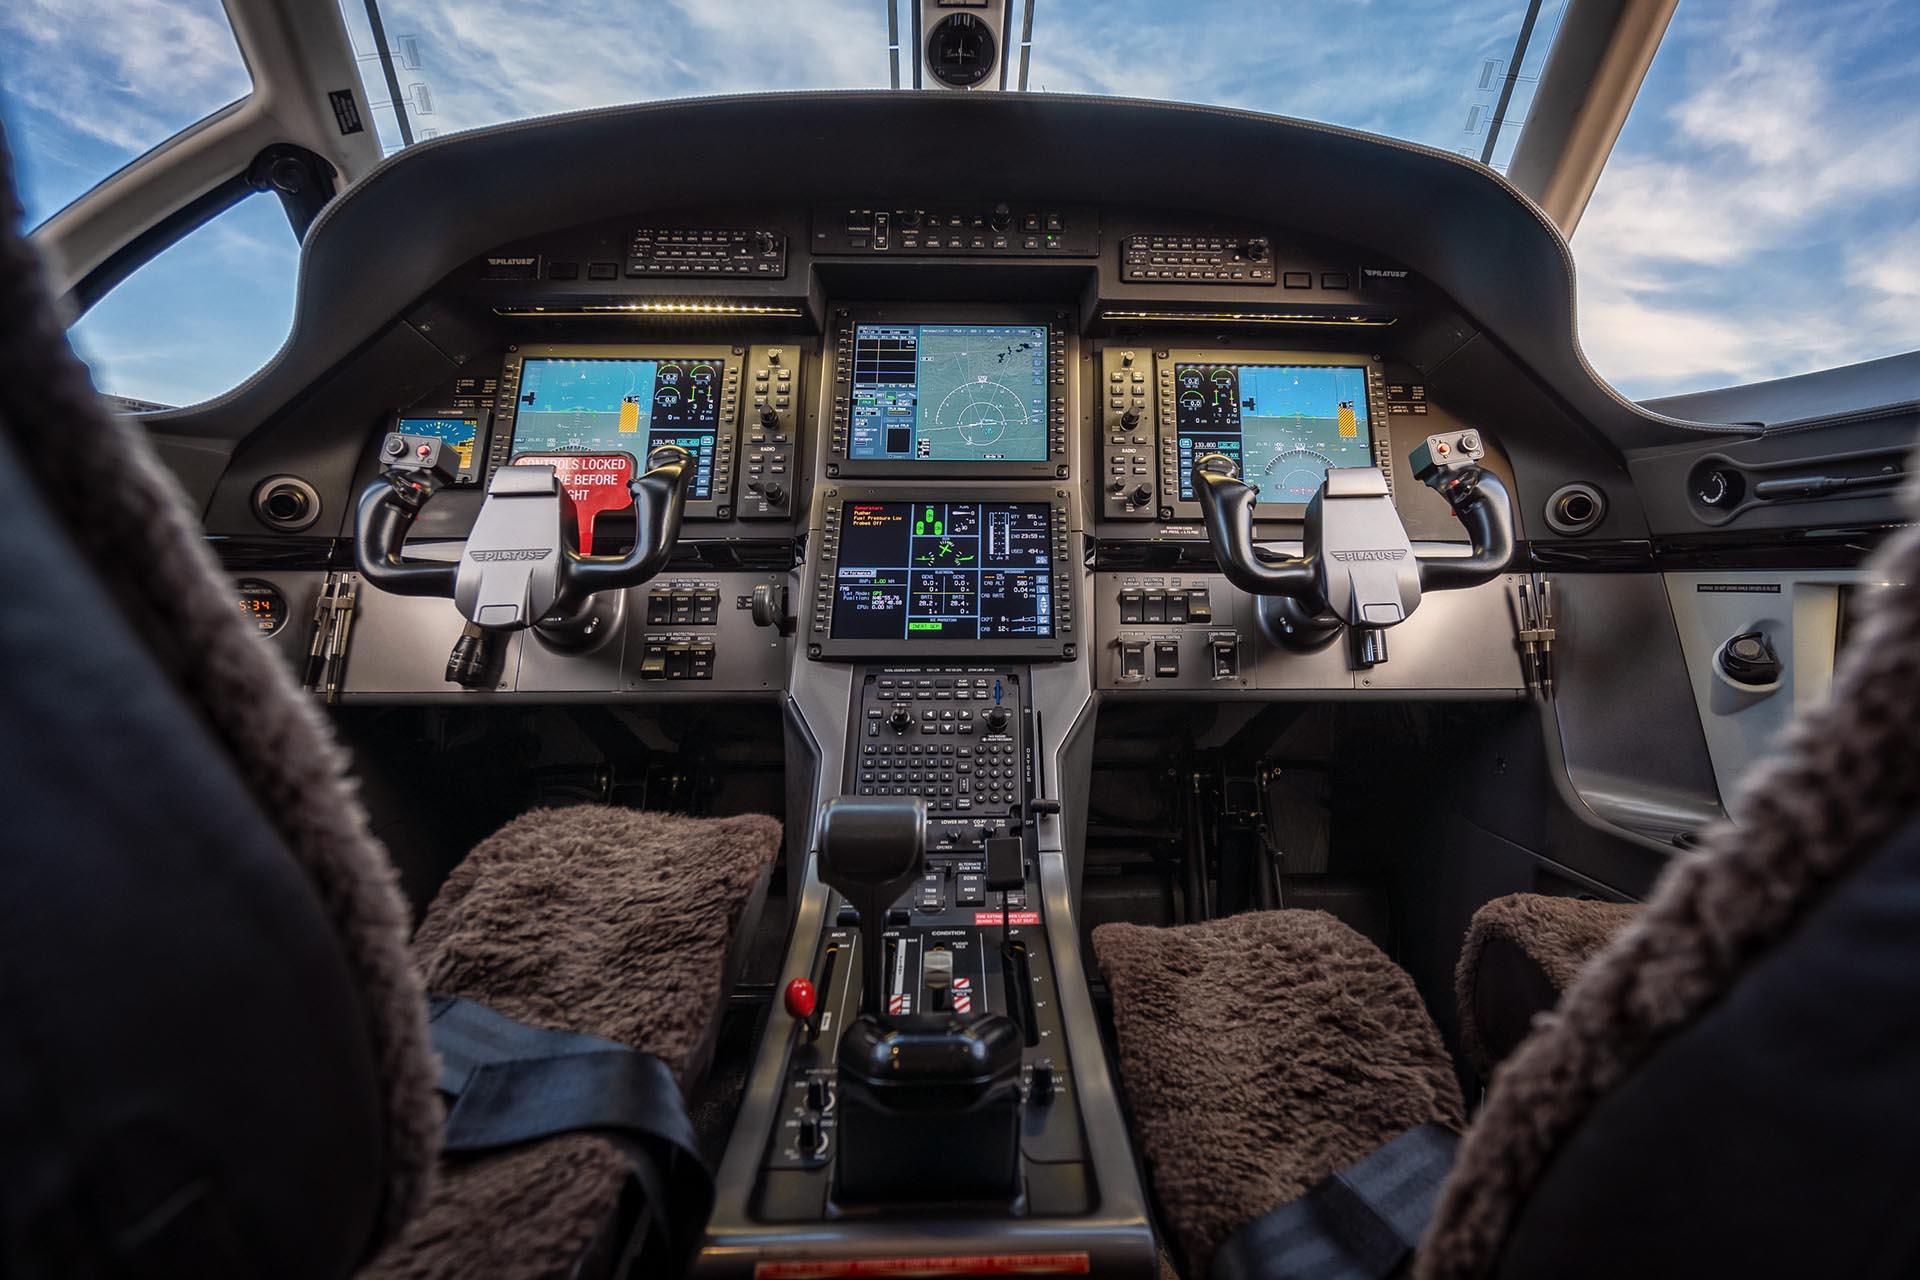 fargo jet center pilatus pc-12 cockpit